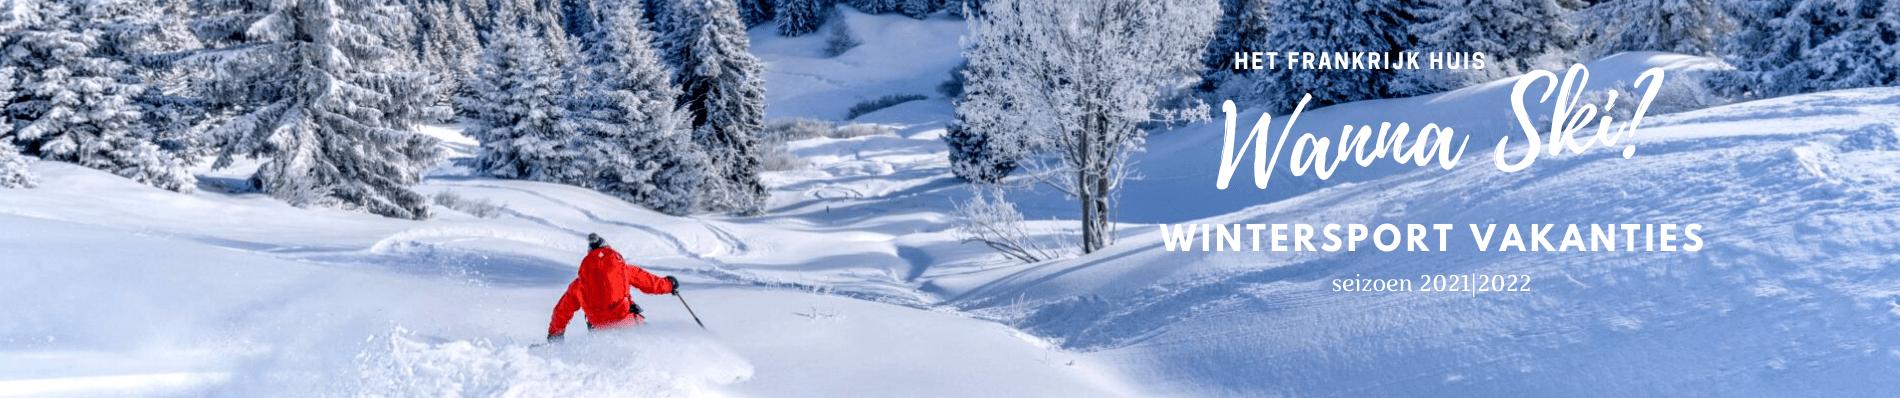 skivakantie wintersport frankrijk franse alpen